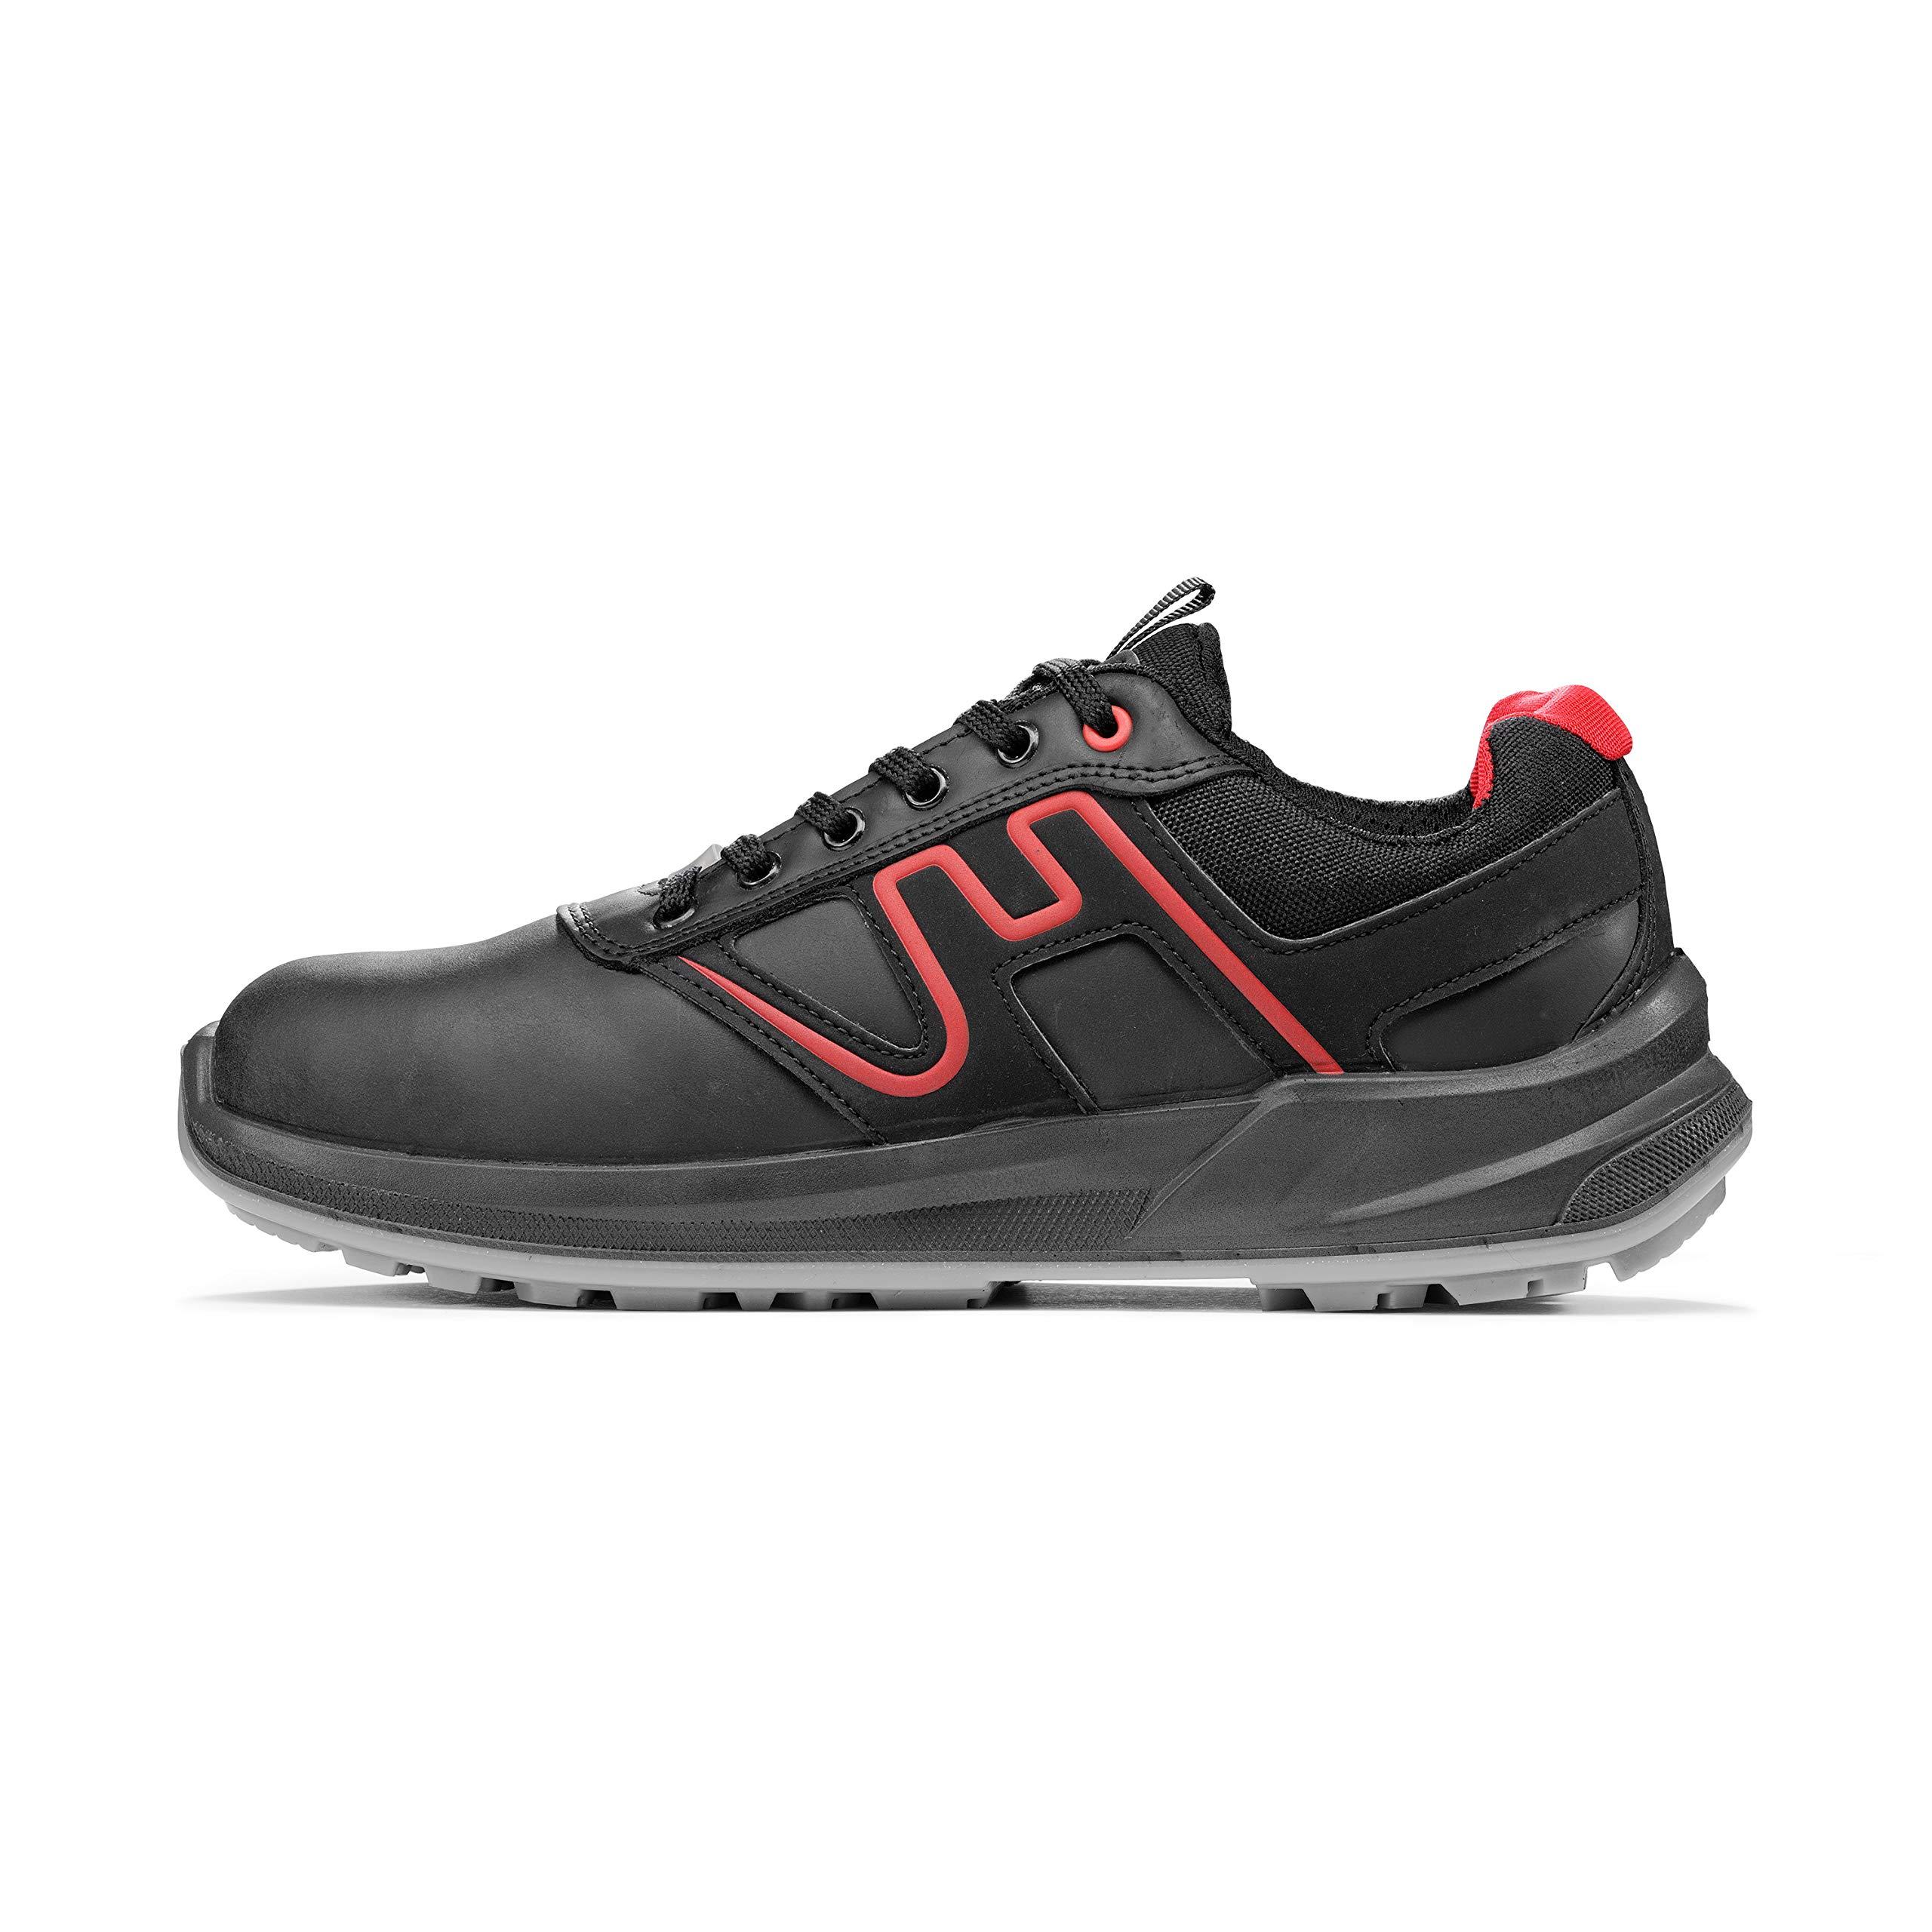 METALLIC S3 SRC ESD, schwarz, rot, 37